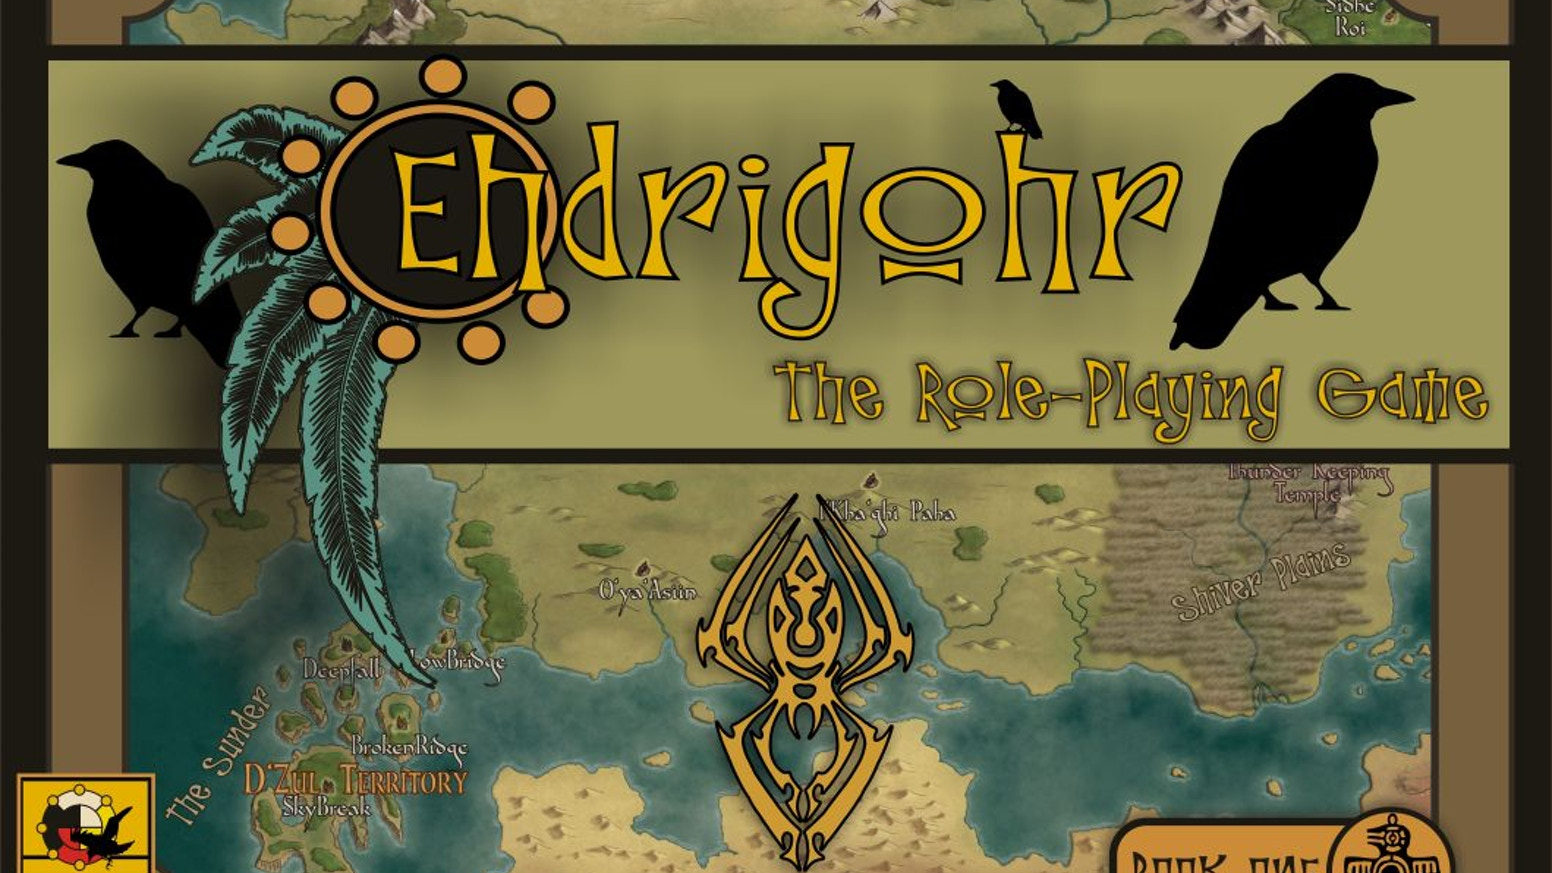 Ehdrigohr: The Roleplaying Game by Allen Turner — Kickstarter